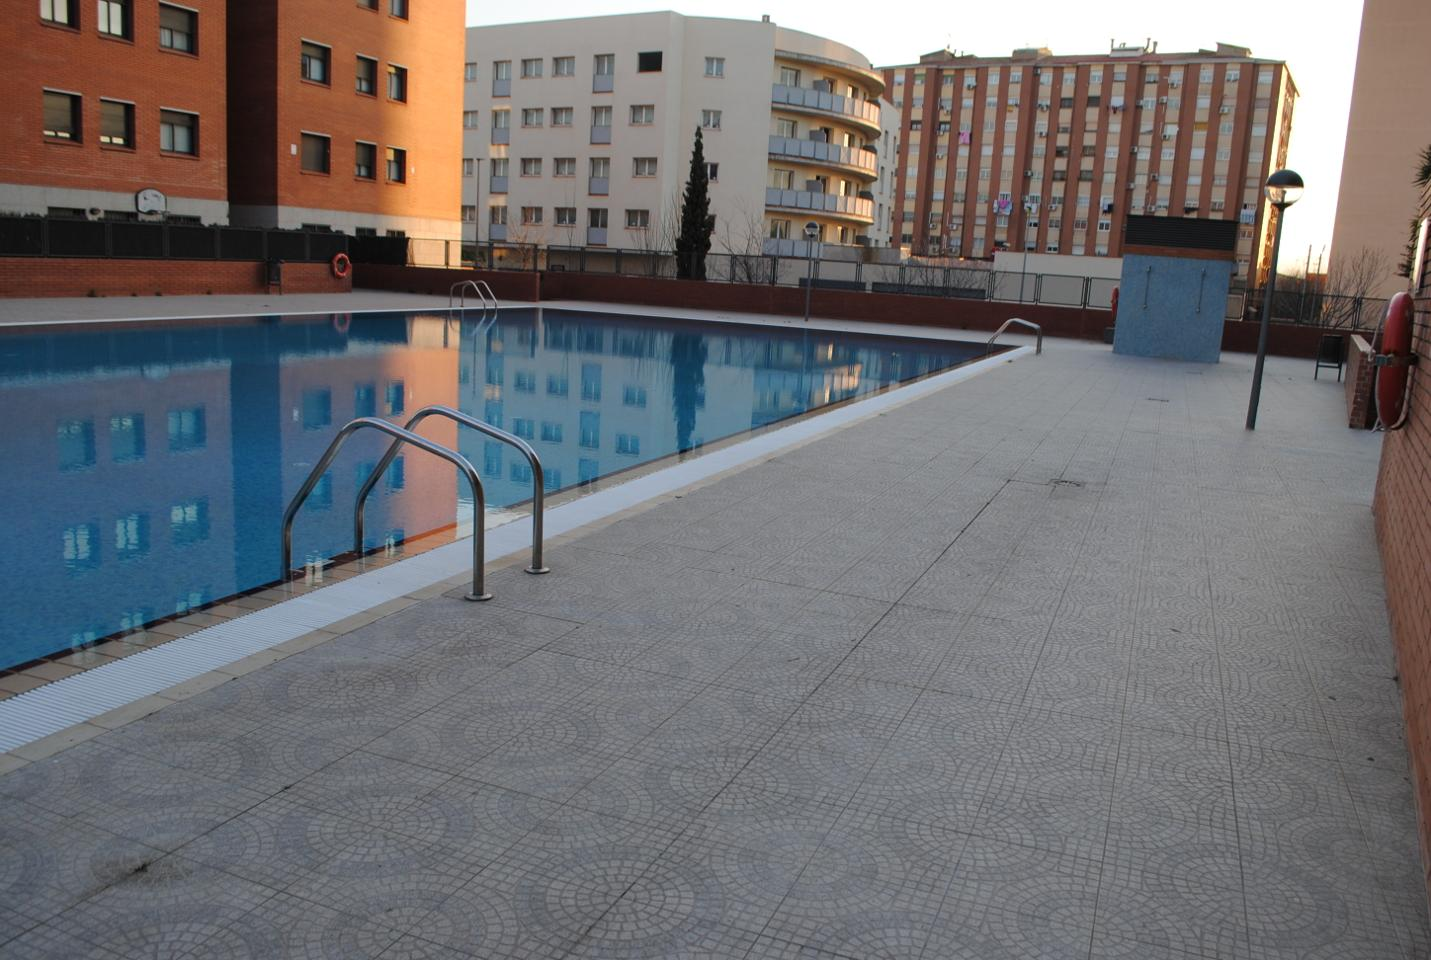 Servicios inmobiliarios en el baix llobregat piso en venta en sant feliu de llobregat de 111 m2 - Pisos en venta sant feliu de llobregat ...